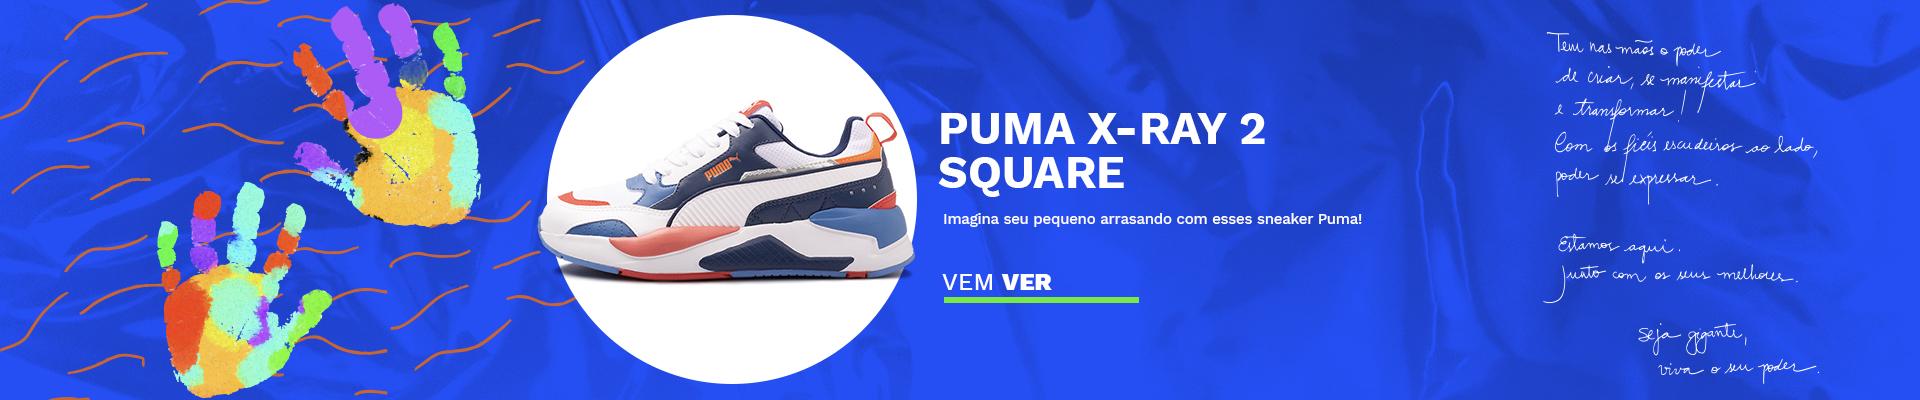 p1-puma-x-ray-2-square